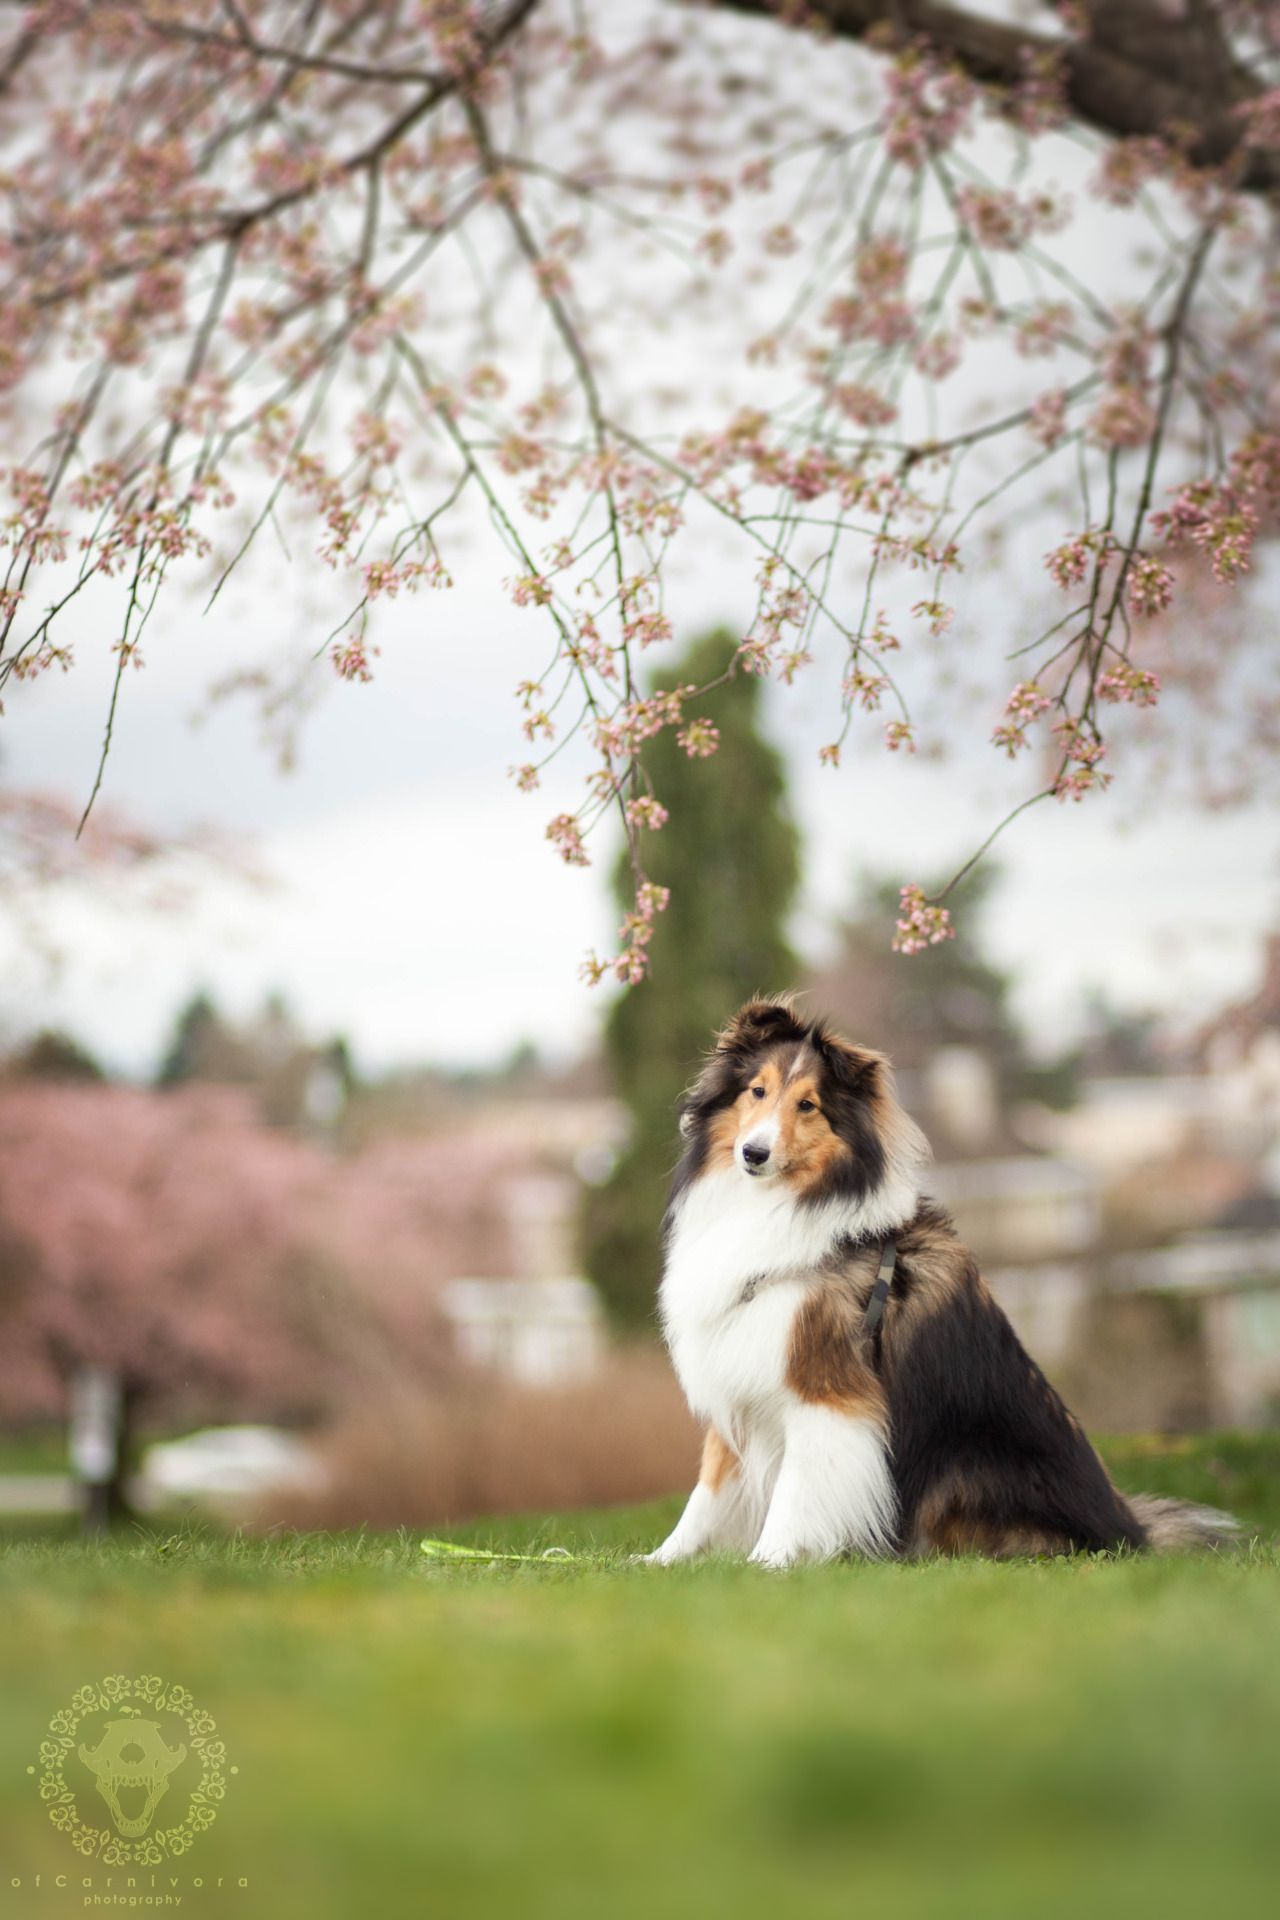 Https Www Tumblr Com Search Sheltie Recent Sheltie Dog Icon